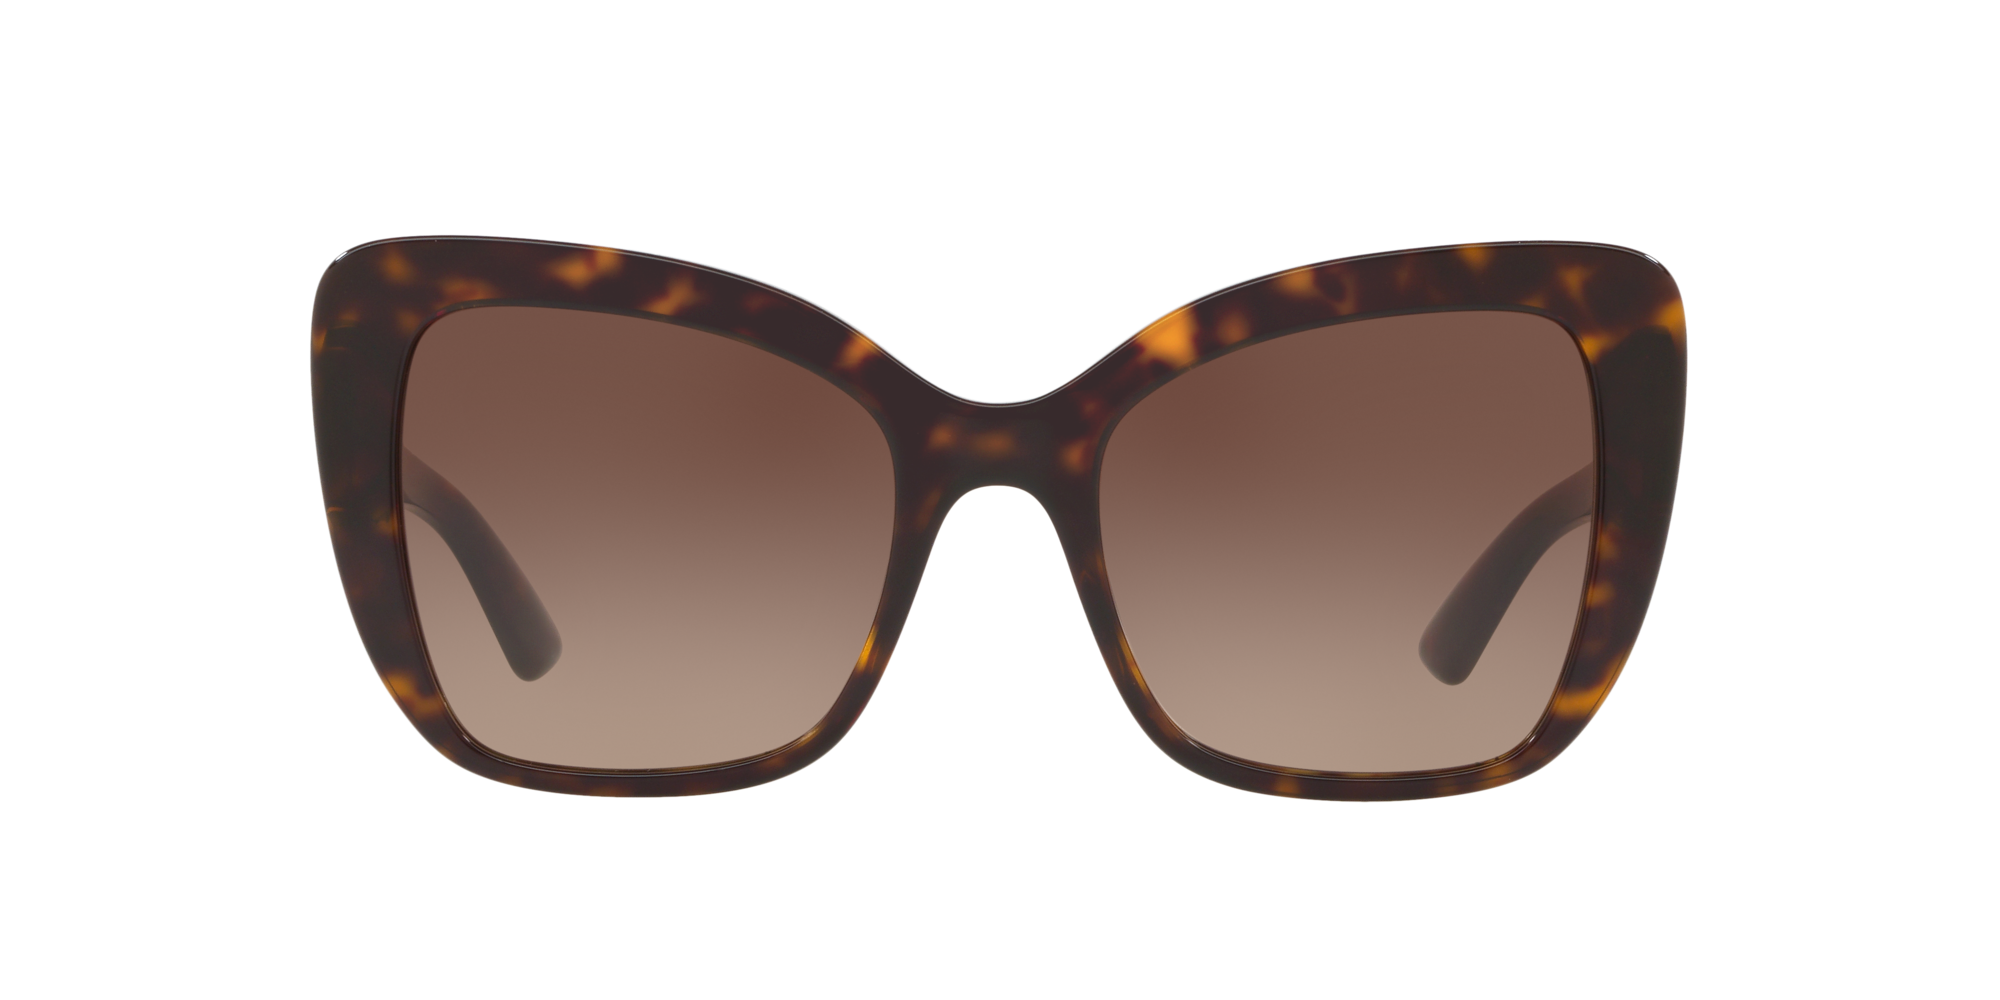 Image for DG4348 54 from LensCrafters | Glasses, Prescription Glasses Online, Eyewear